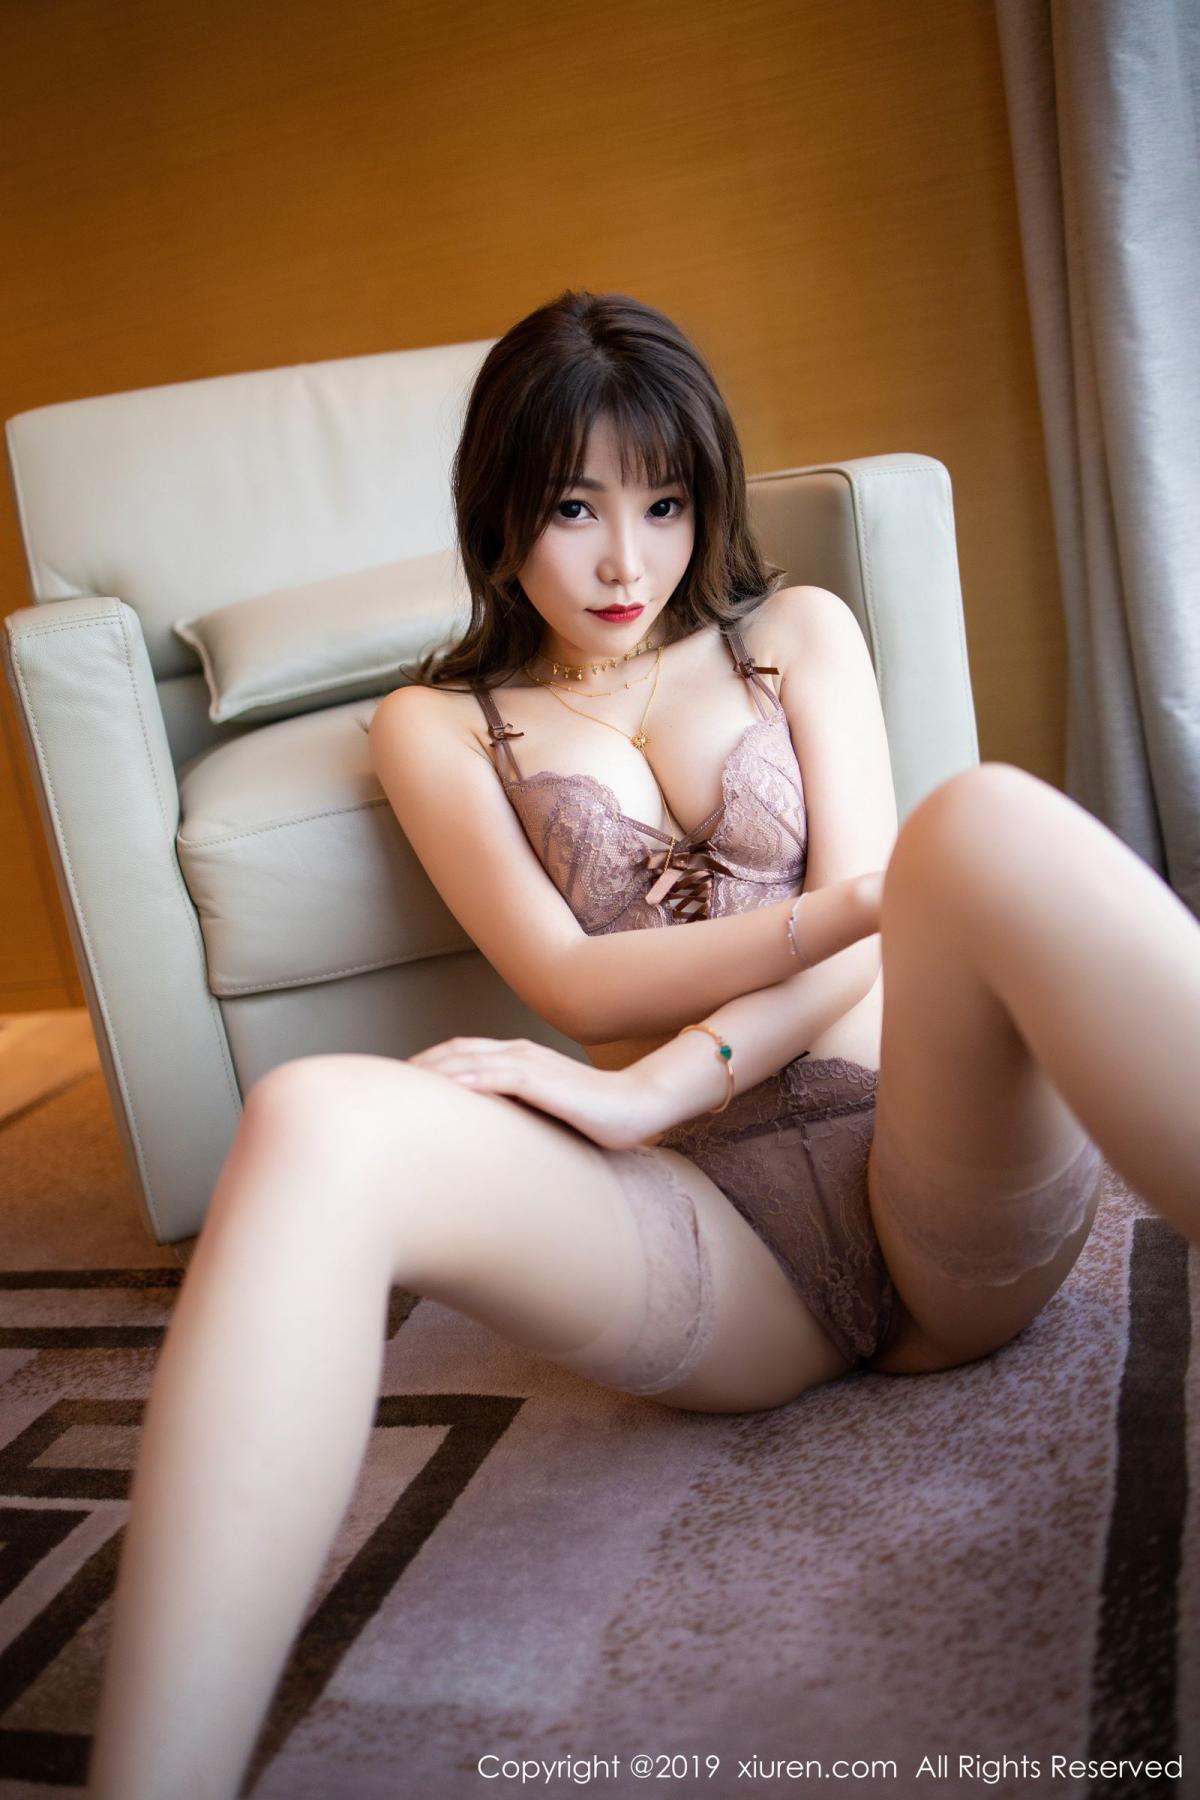 [XiuRen] Vol.1675 Chen Zhi 49P, Chen Zhi, Cheongsam, Tall, Underwear, Xiuren